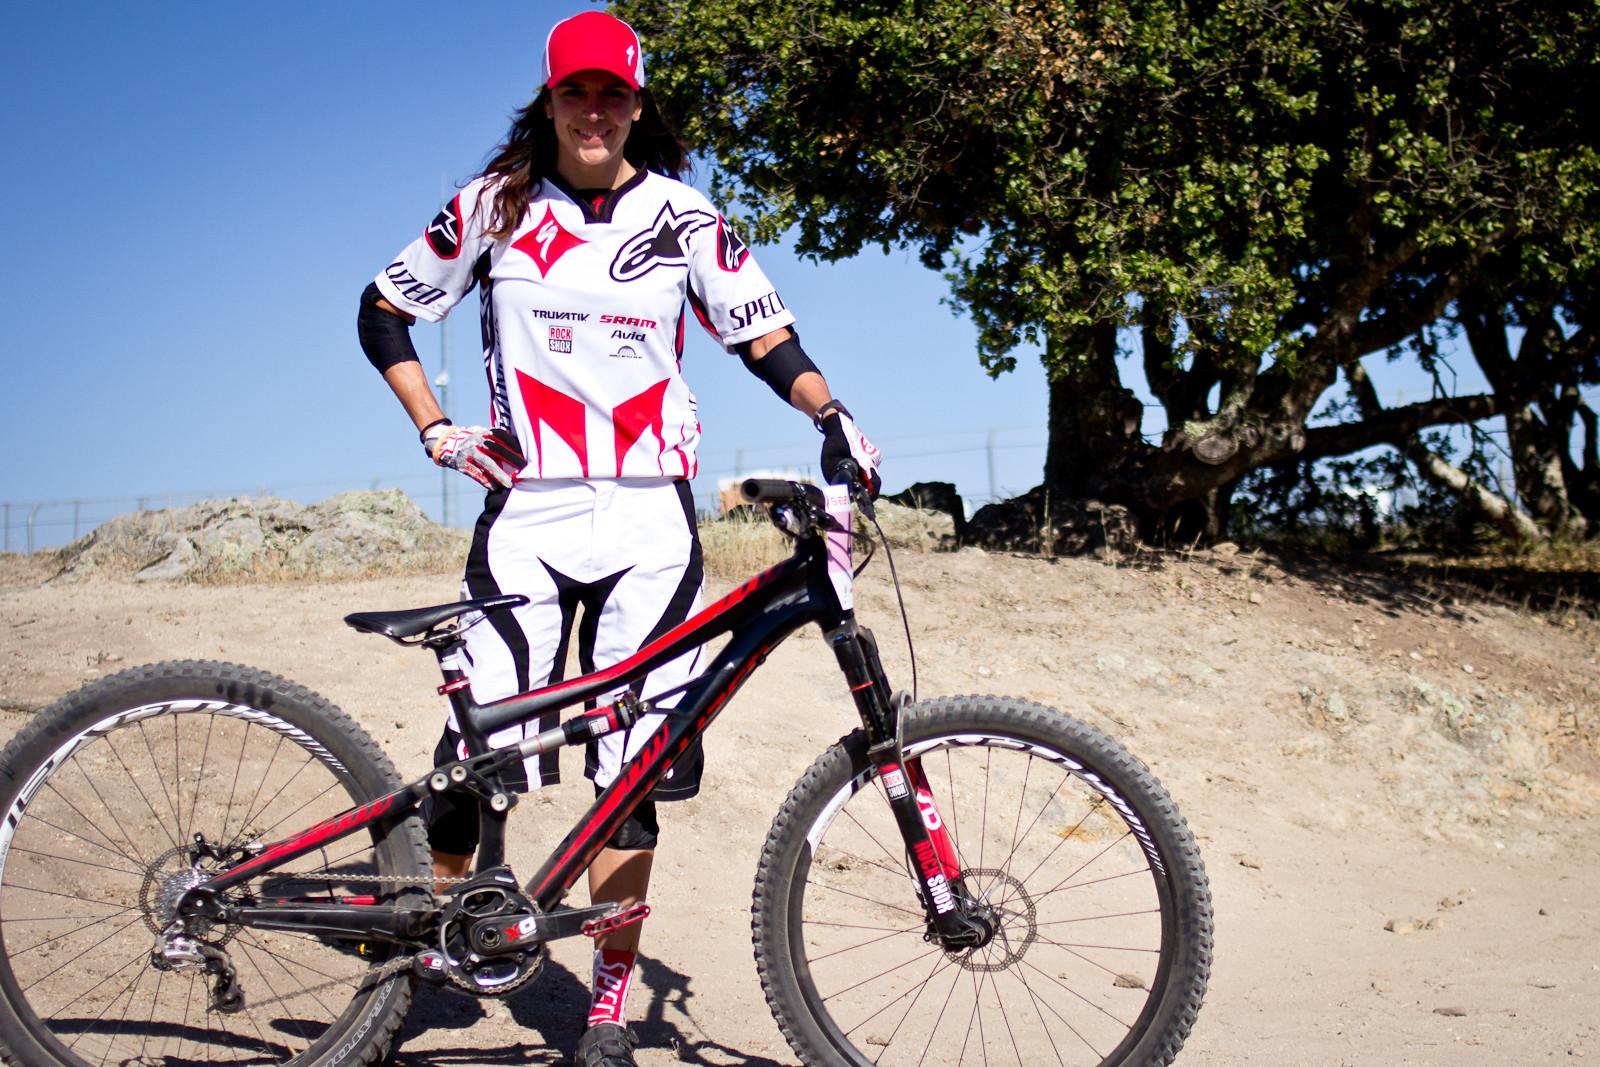 Anneke Beerten's 2014 Specialized Enduro SX Slalom Bike - 2013 Sea Otter Pro Slalom Bikes - Mountain Biking Pictures - Vital MTB